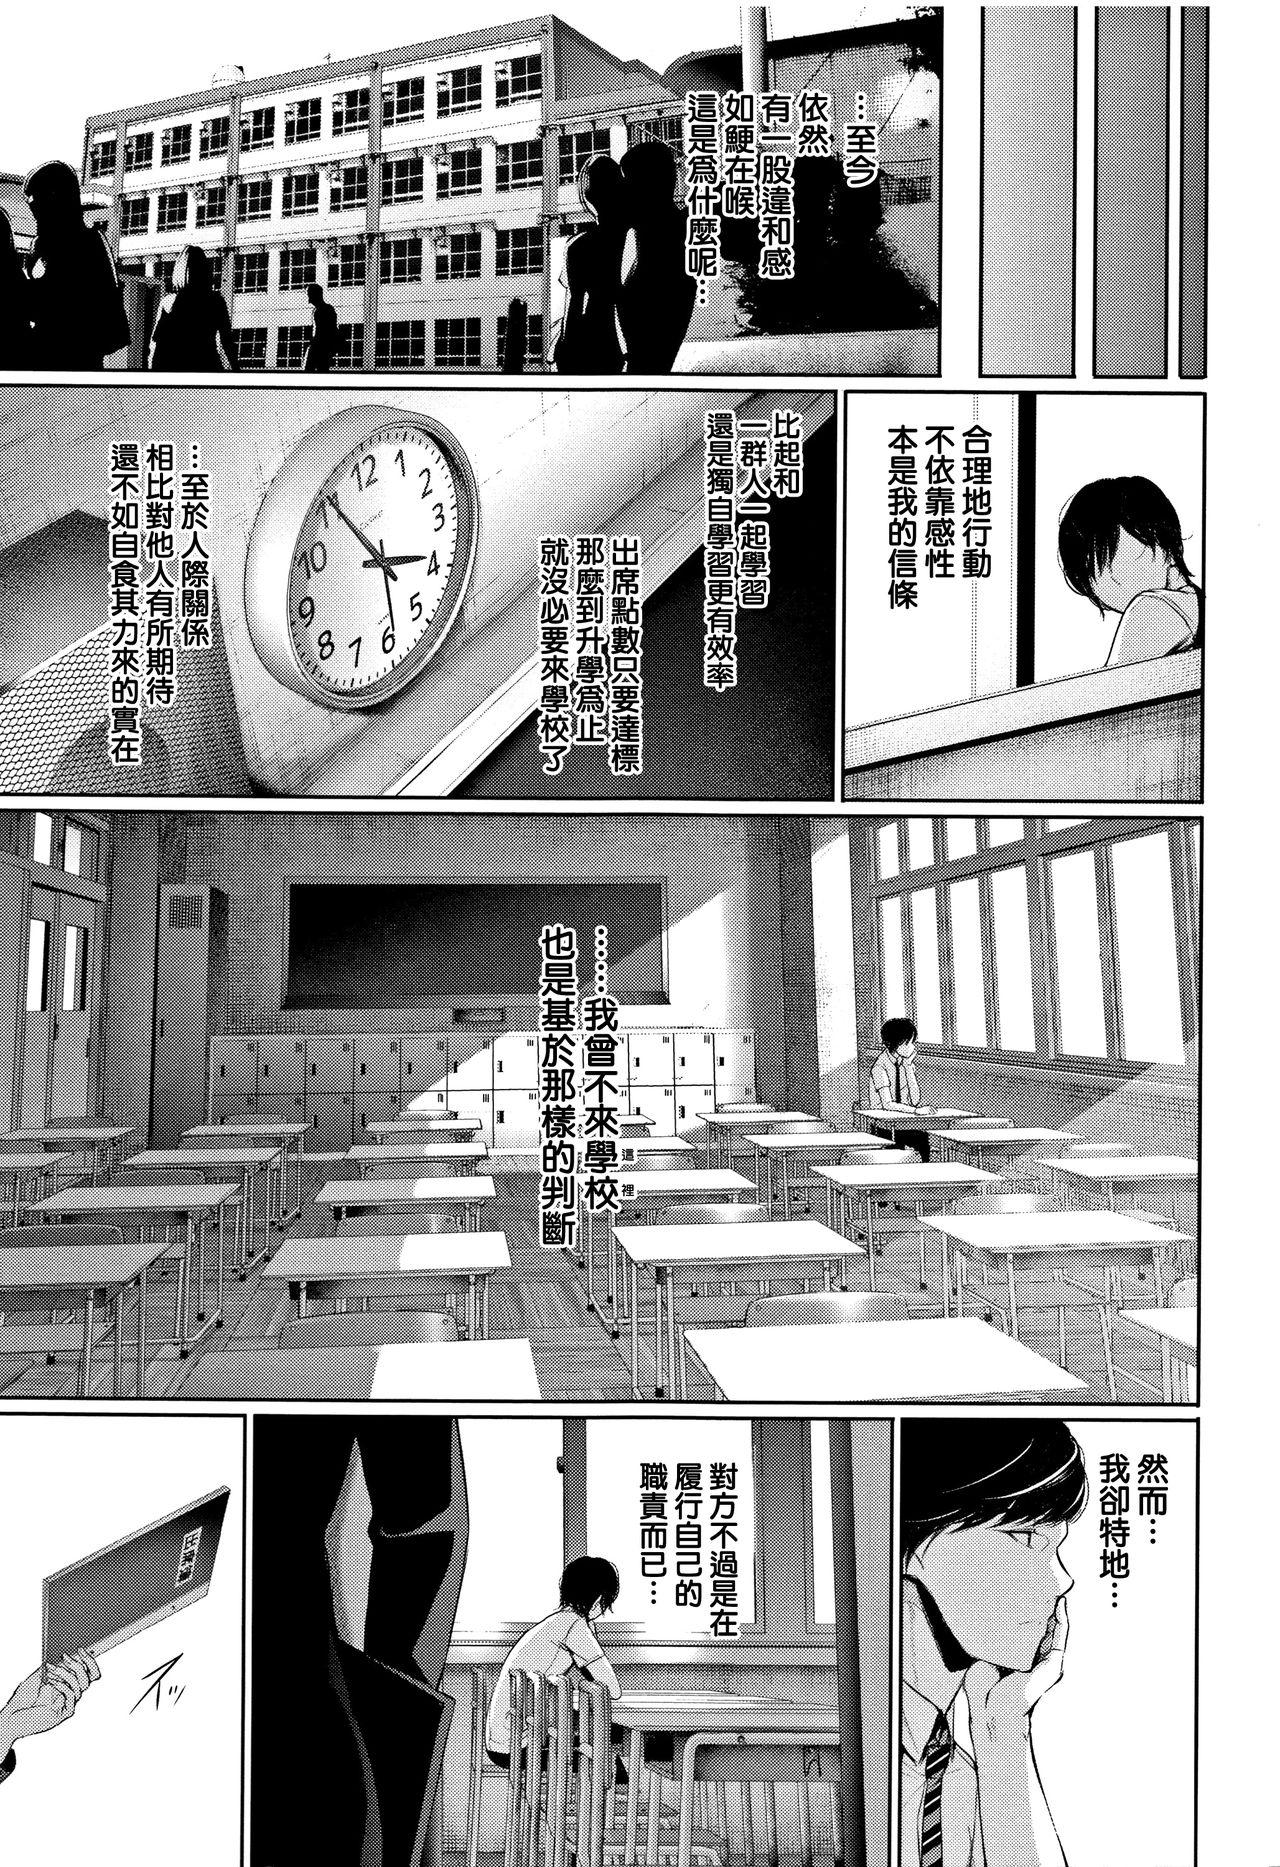 [Gentsuki] Kimi Omou Koi - I think of you. Ch. 1-7 [Chinese] [无毒汉化组] 133